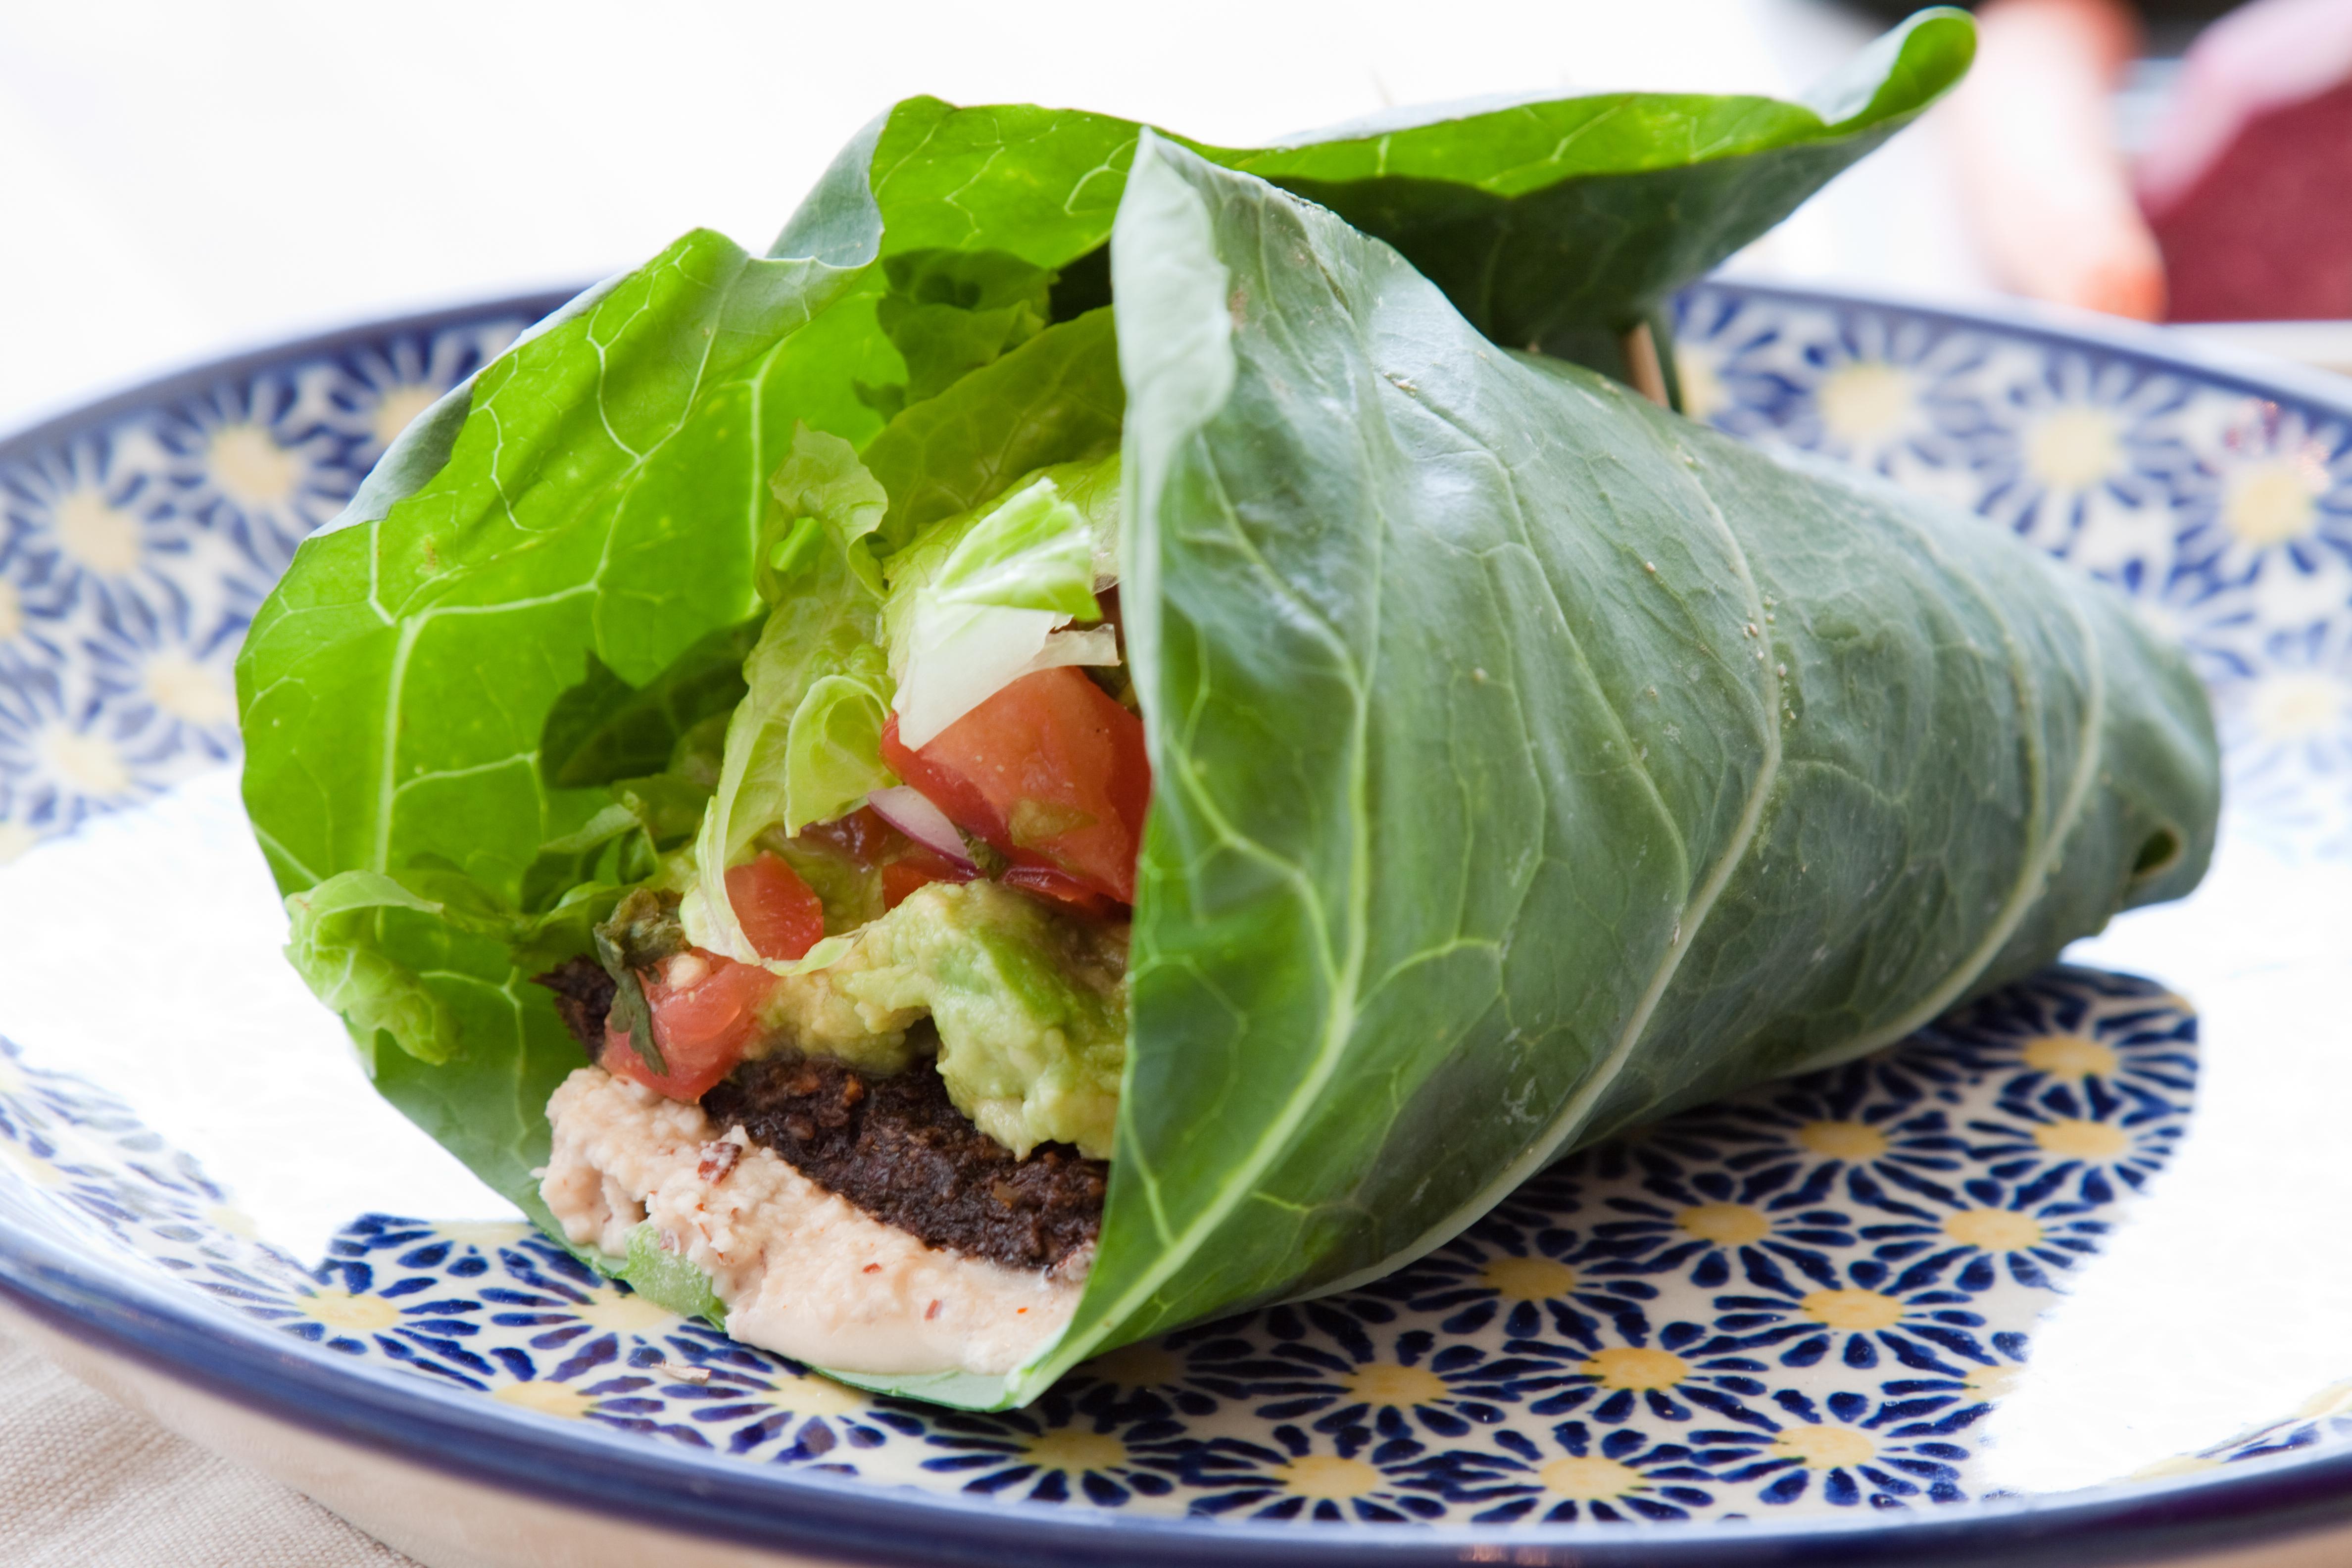 Priority Health Personal Wellness Veggie Swap Lettuce Wrap